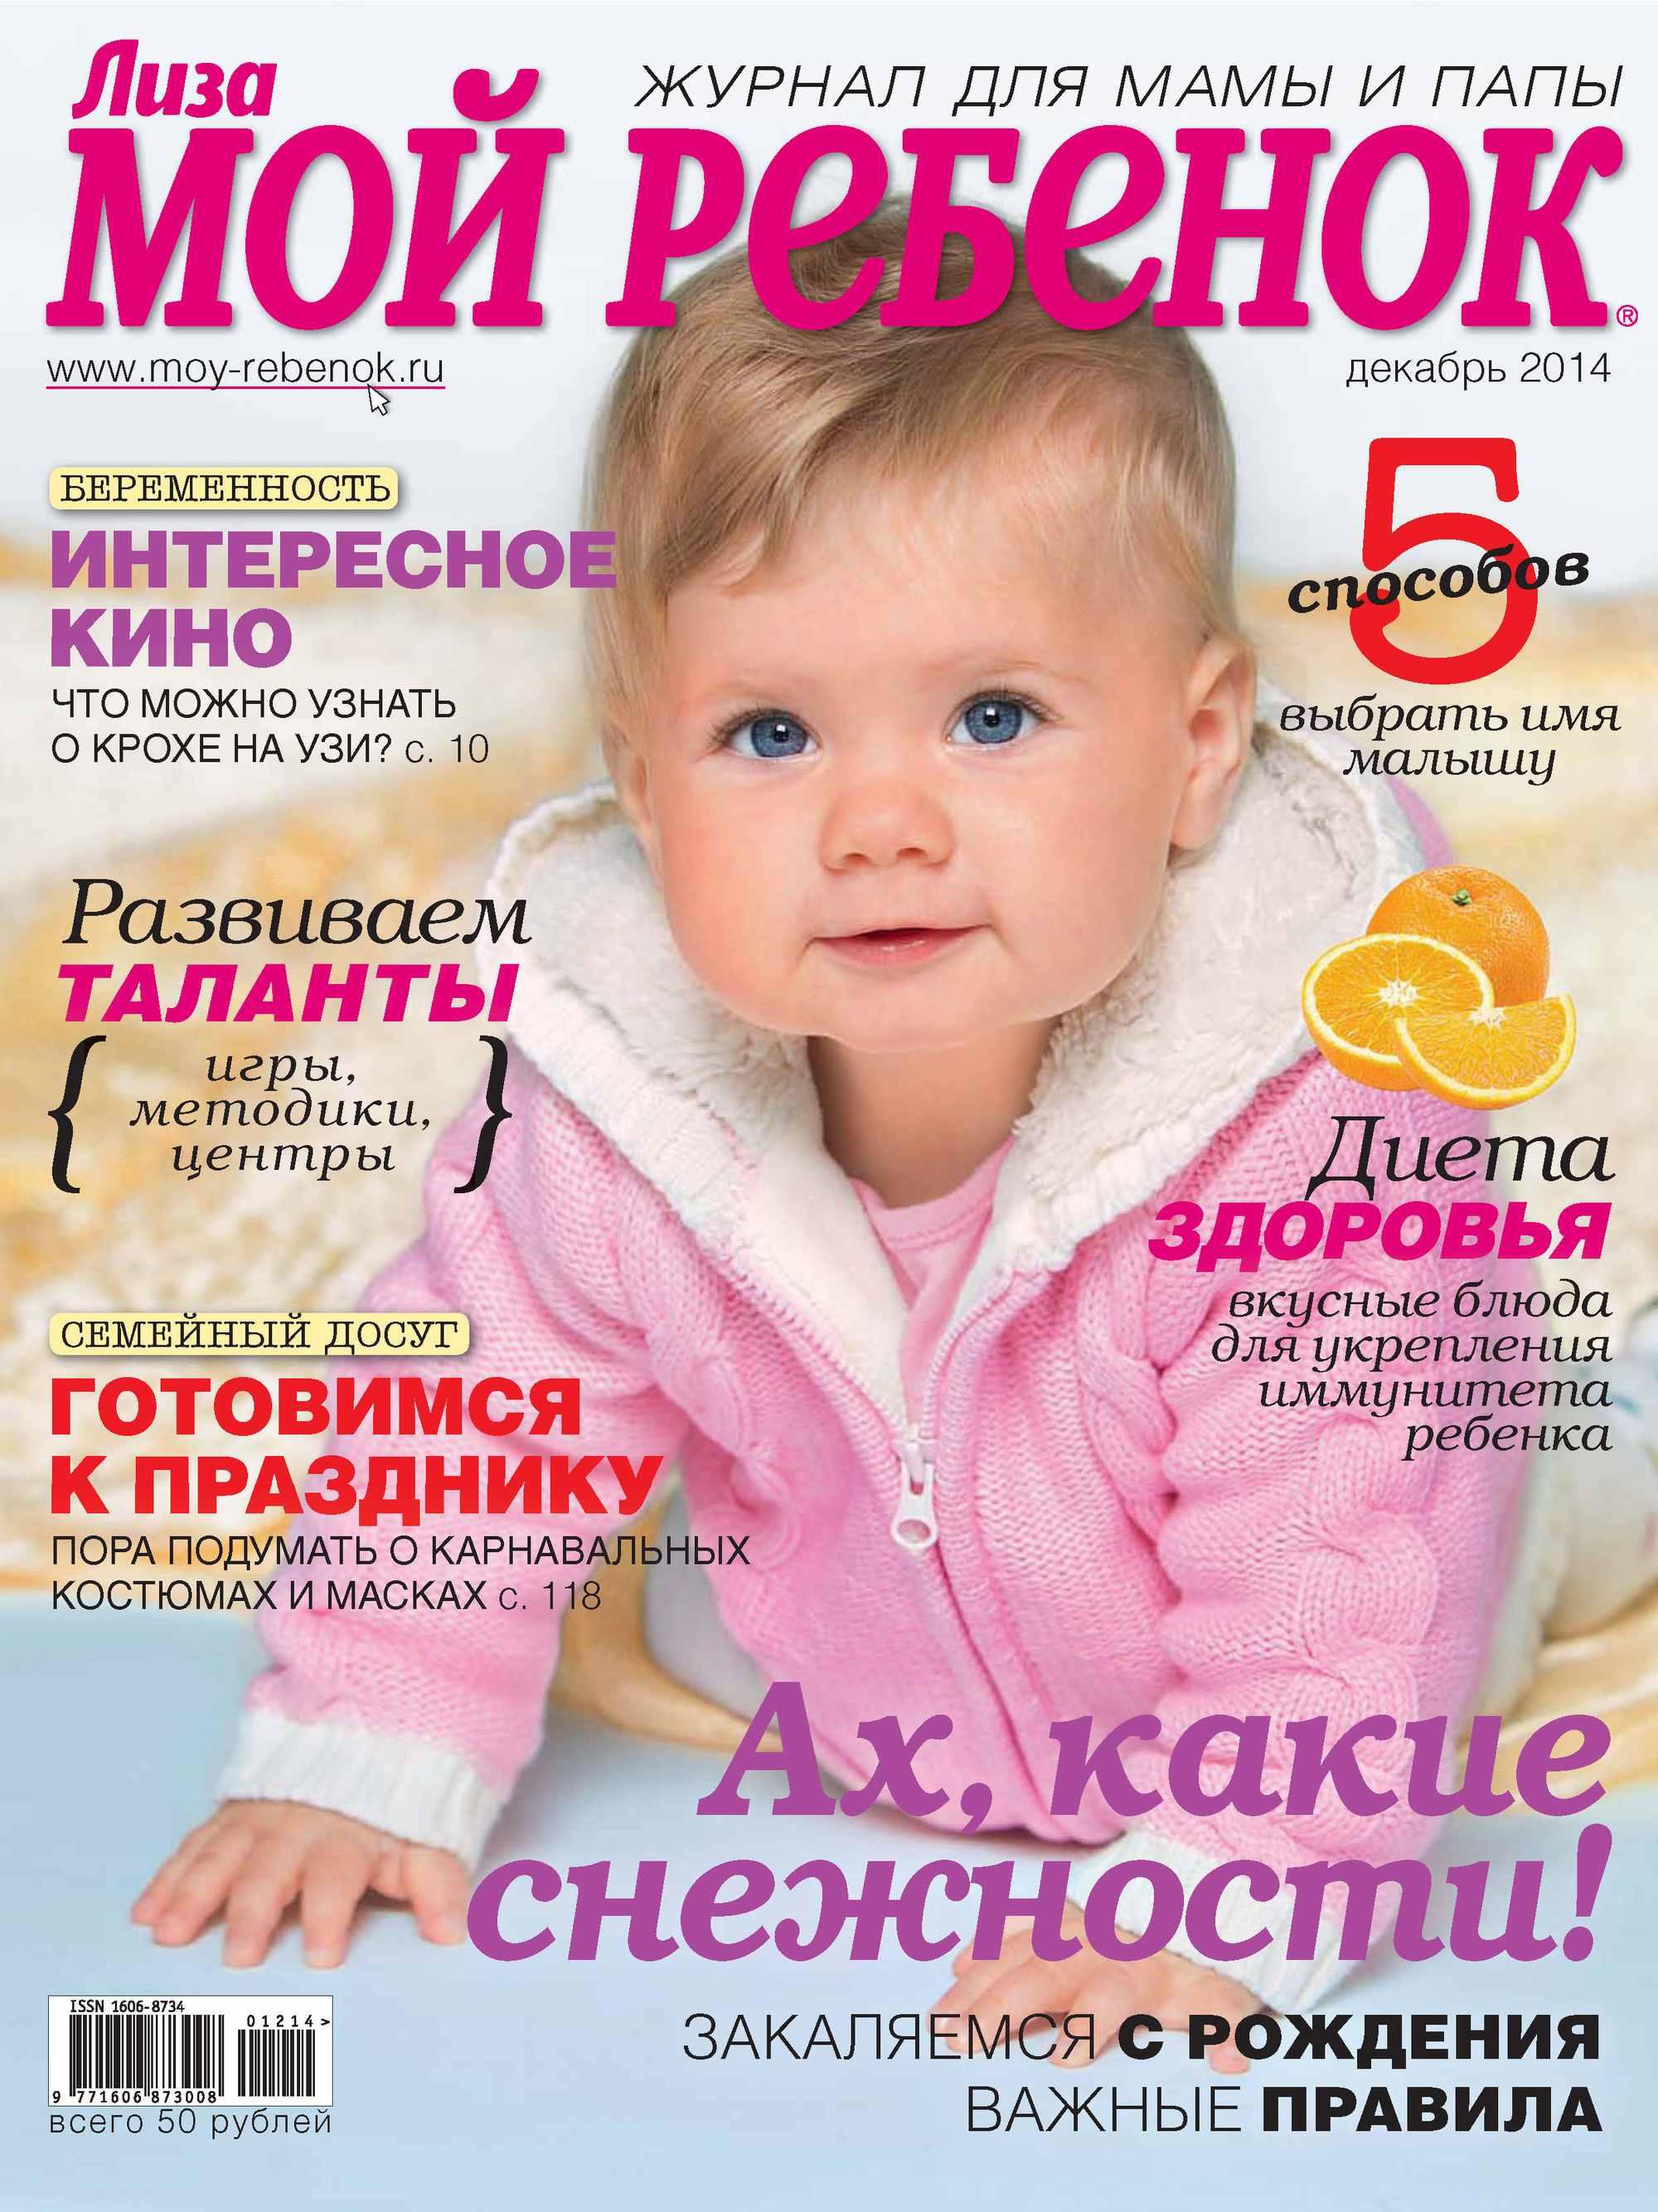 Журнал «Лиза. Мой ребенок» № 12/2014